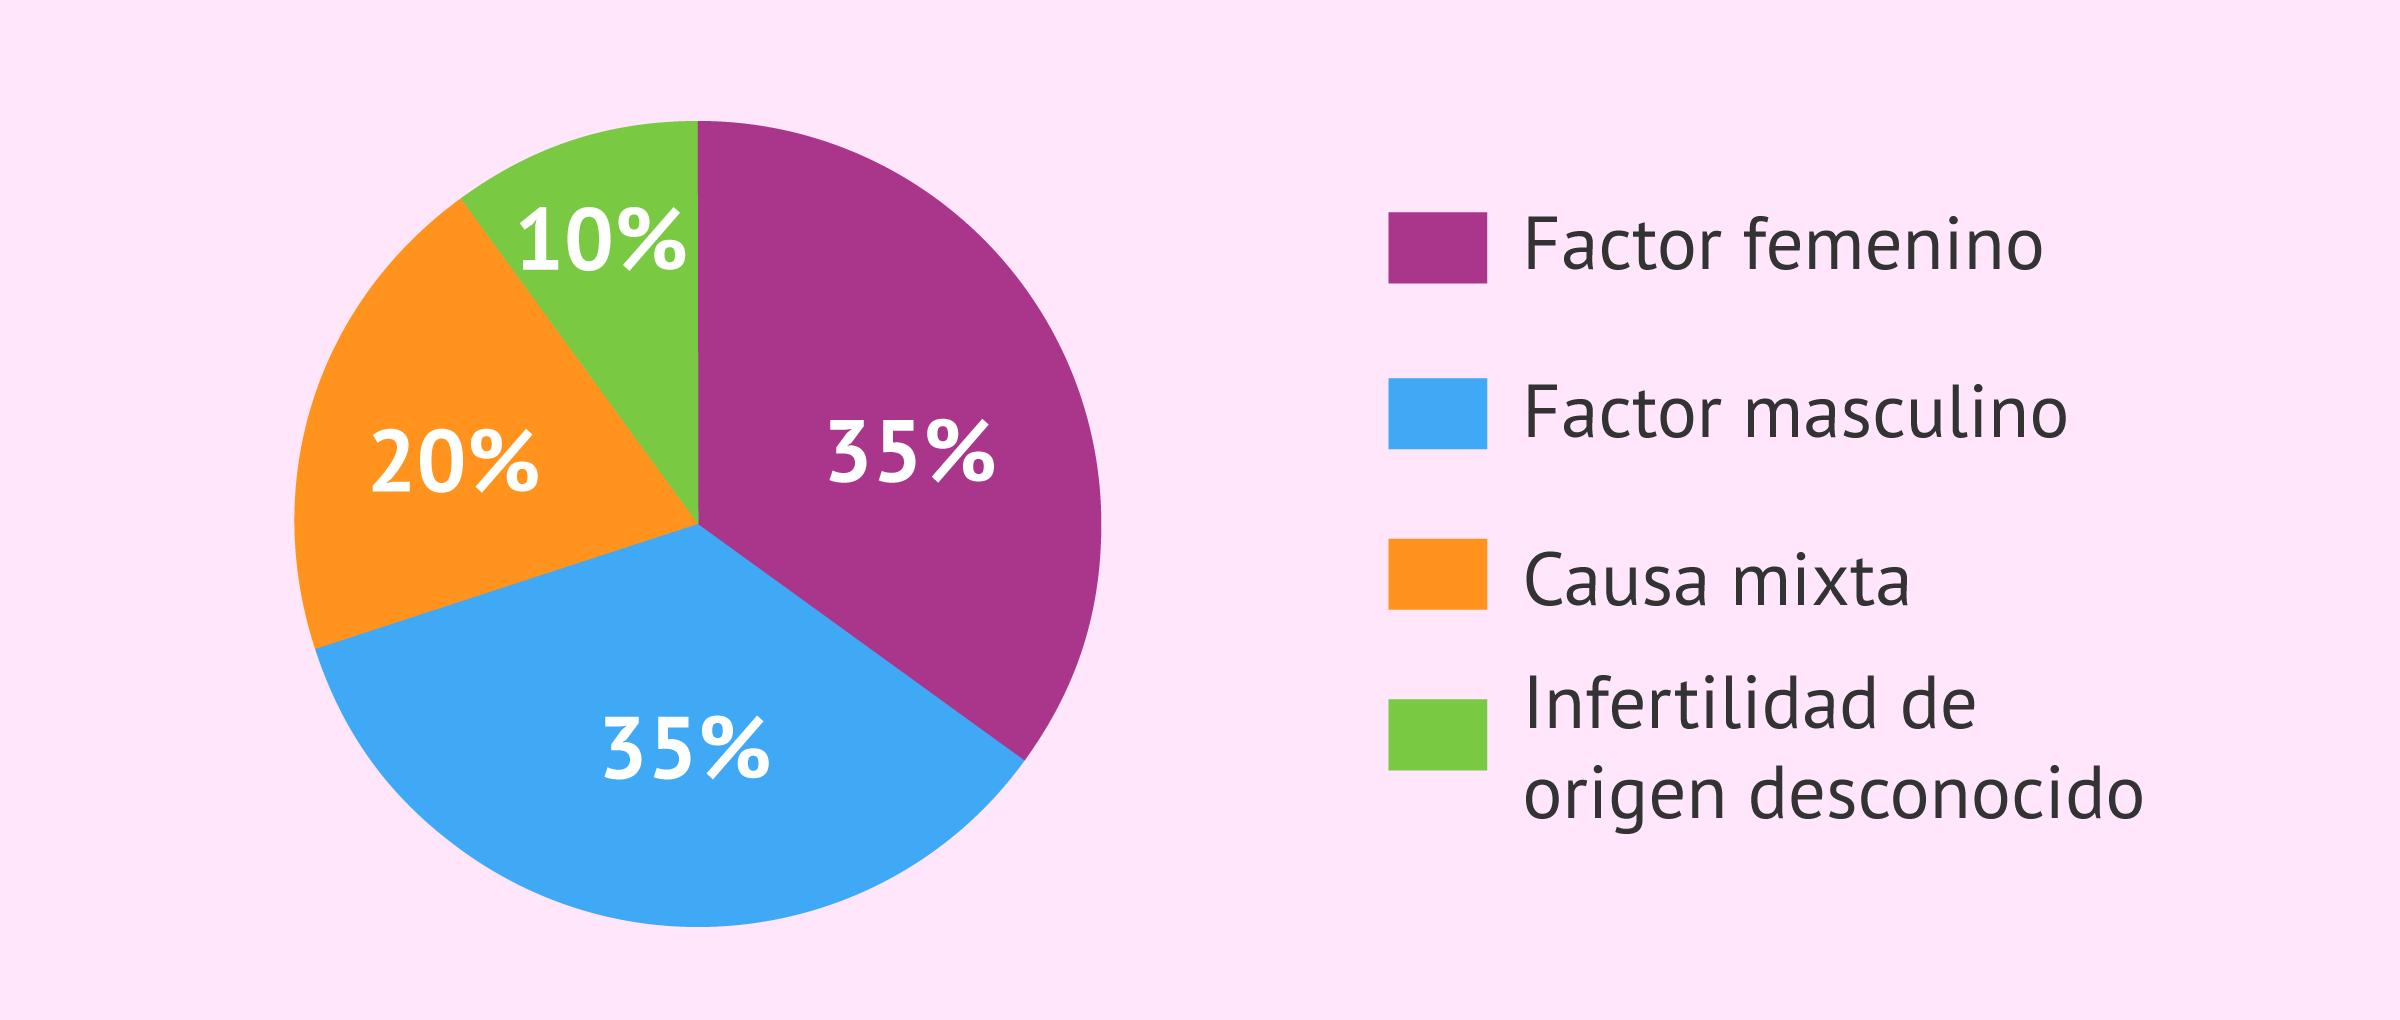 Origen de la infertilidad